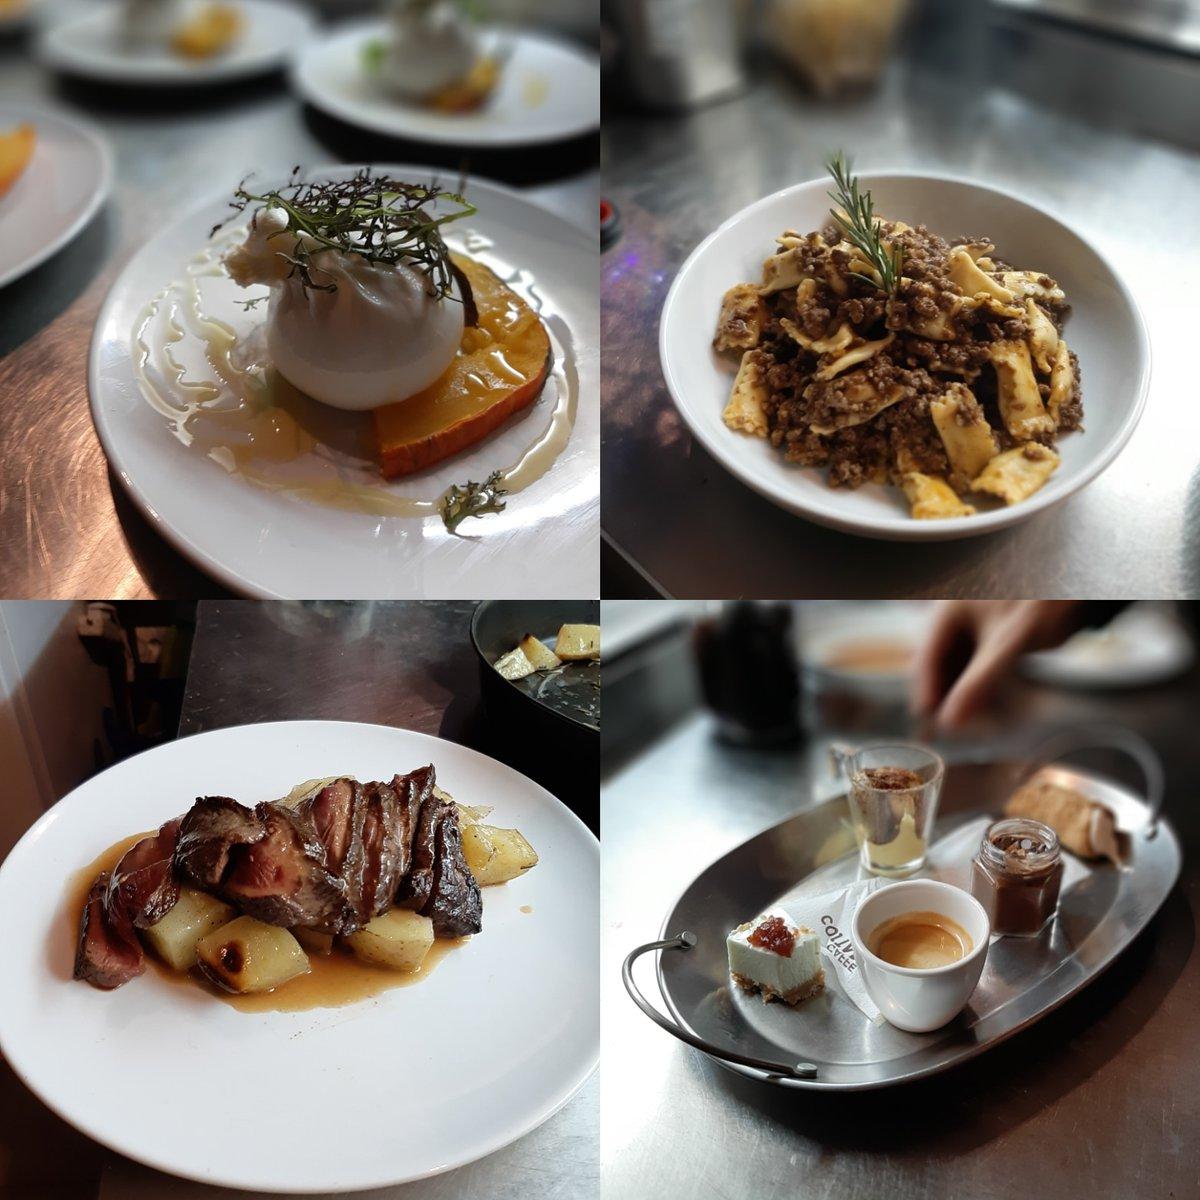 PrimoPiatto vous souhaite un bon week-end#primopiattonice #produitfrais #cuisineitalienne #produitdesaison #Nice06 #ilovenice #ruedefly #weekendpic.twitter.com/EPuGn7SbF7